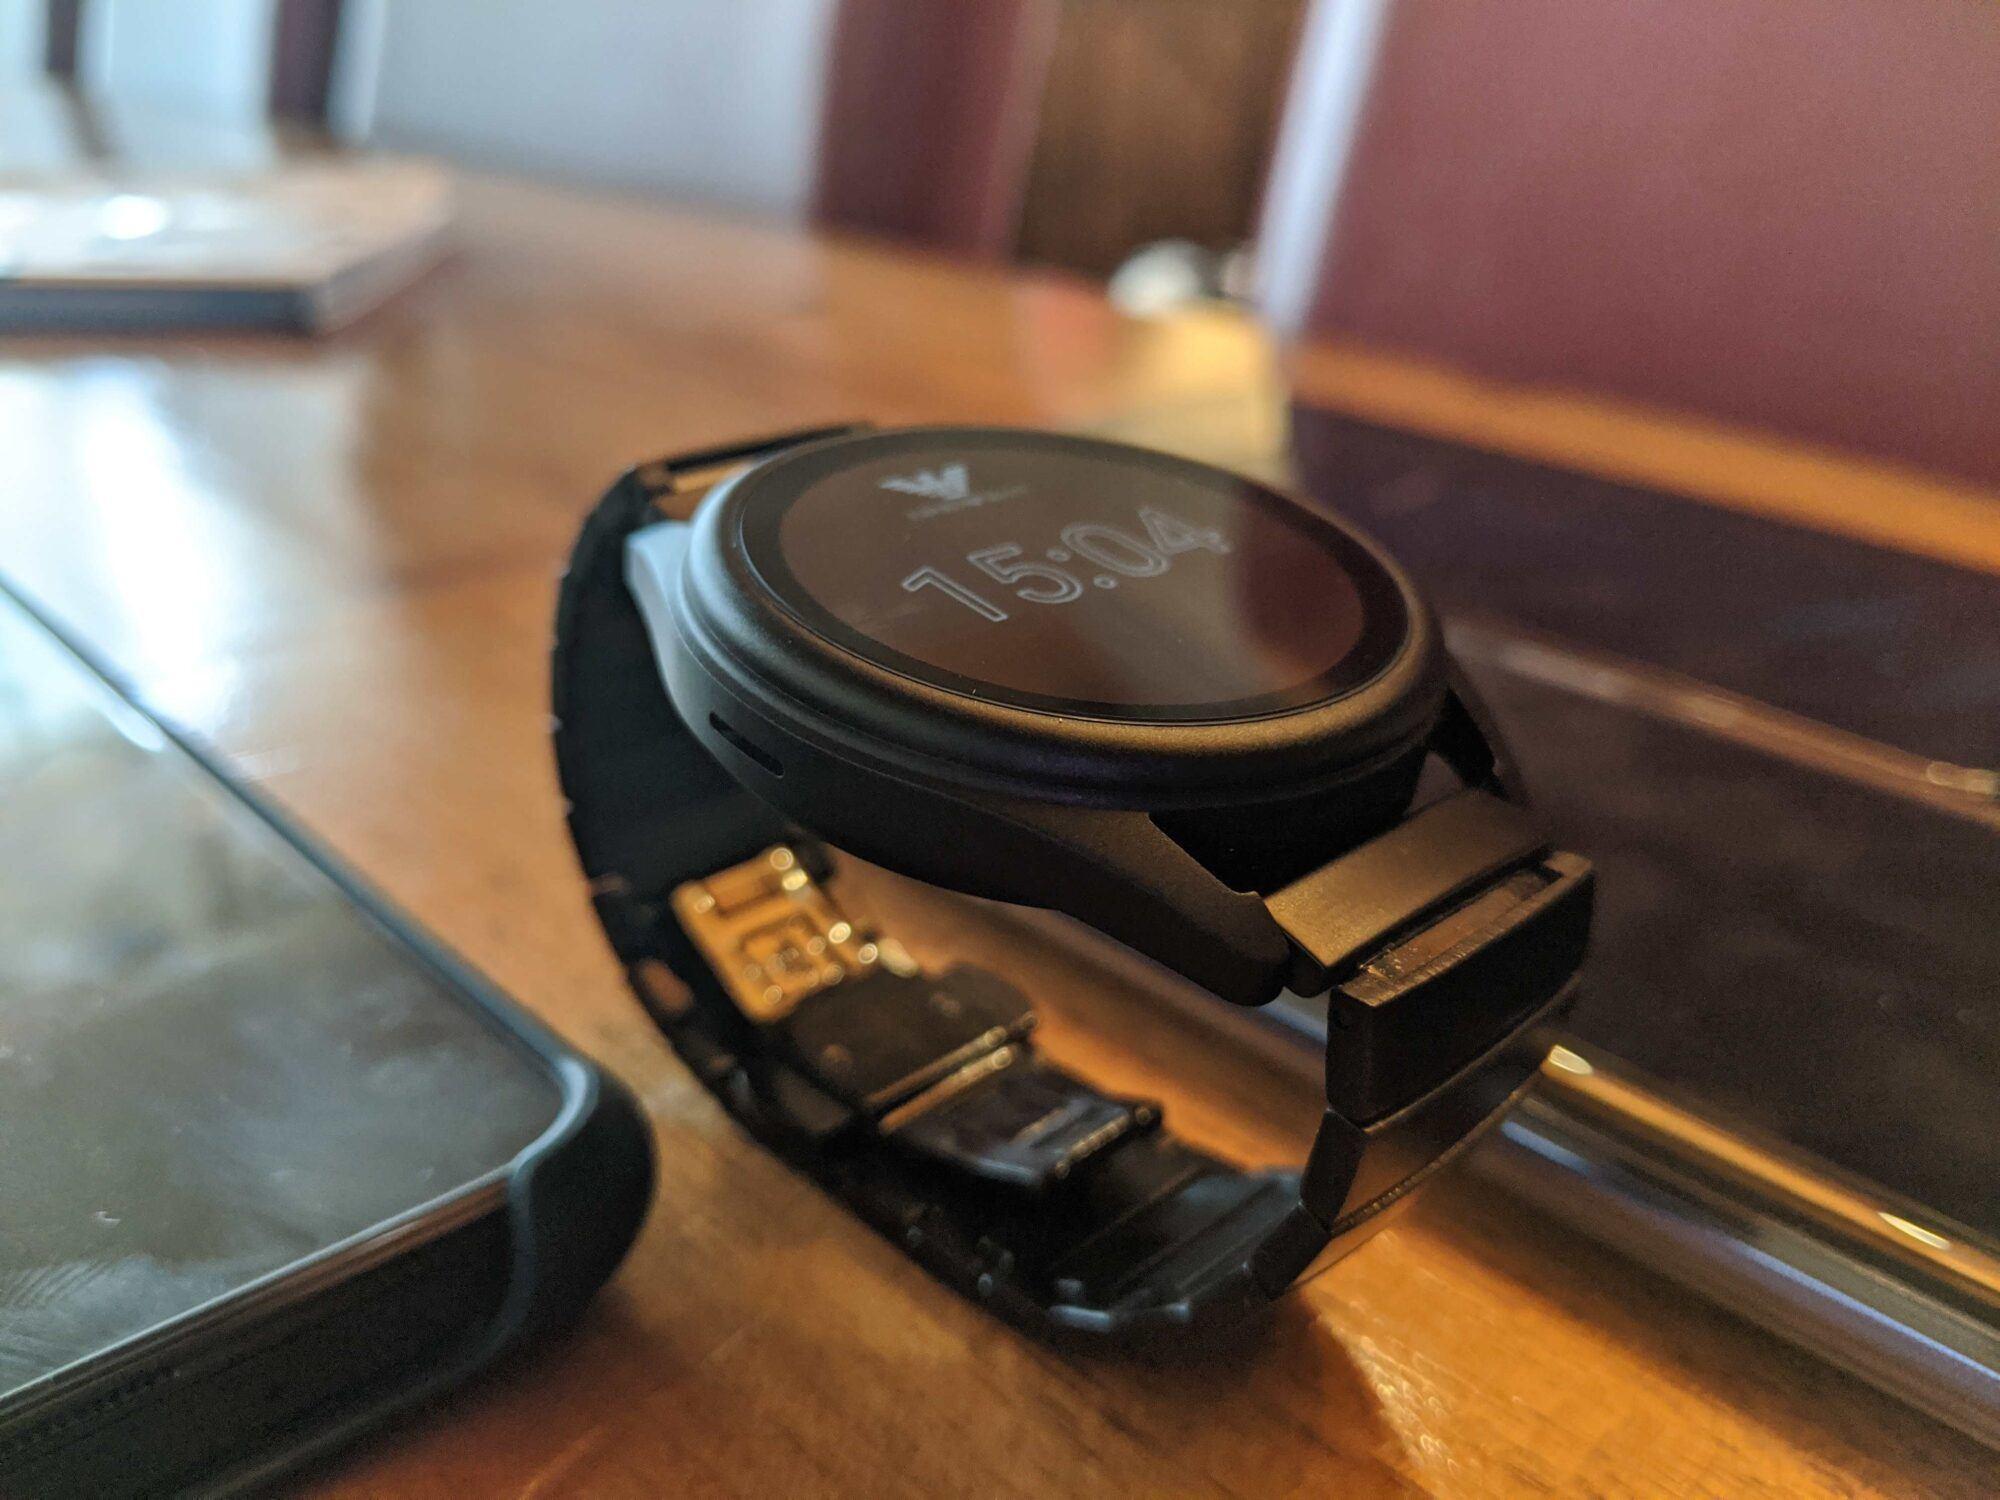 smartwatch Emporio Armani, TEST – Emporio Armani Smartwatch 3 – Le prestige avant tout